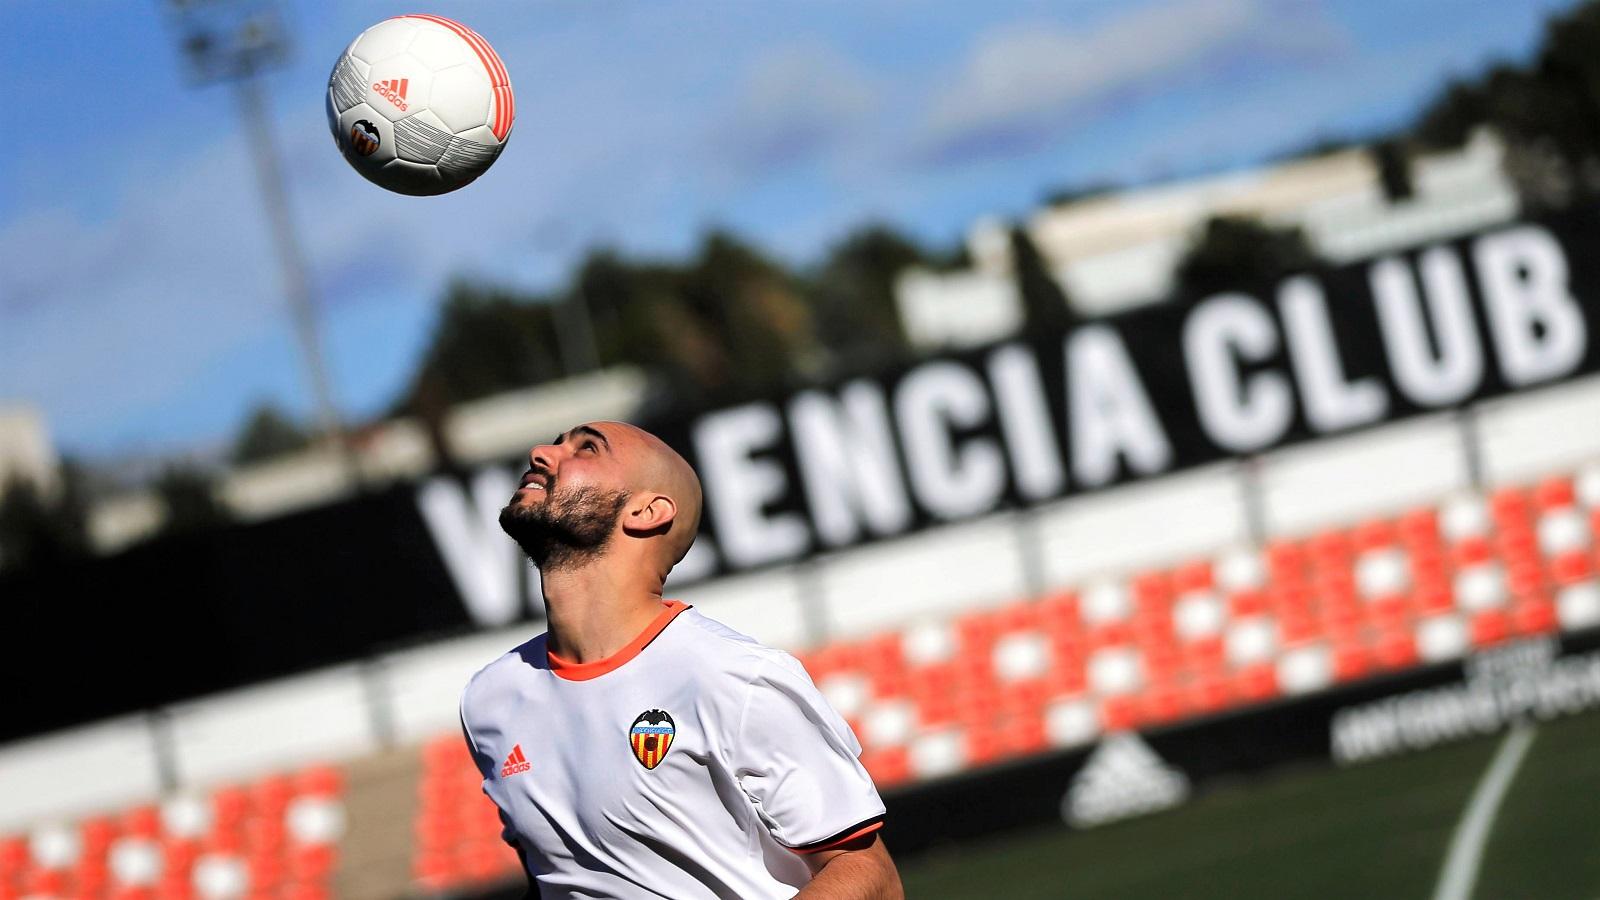 VIDEO: ¡Simone Zaza se pronuncia sobre su futuro en el Valencia!